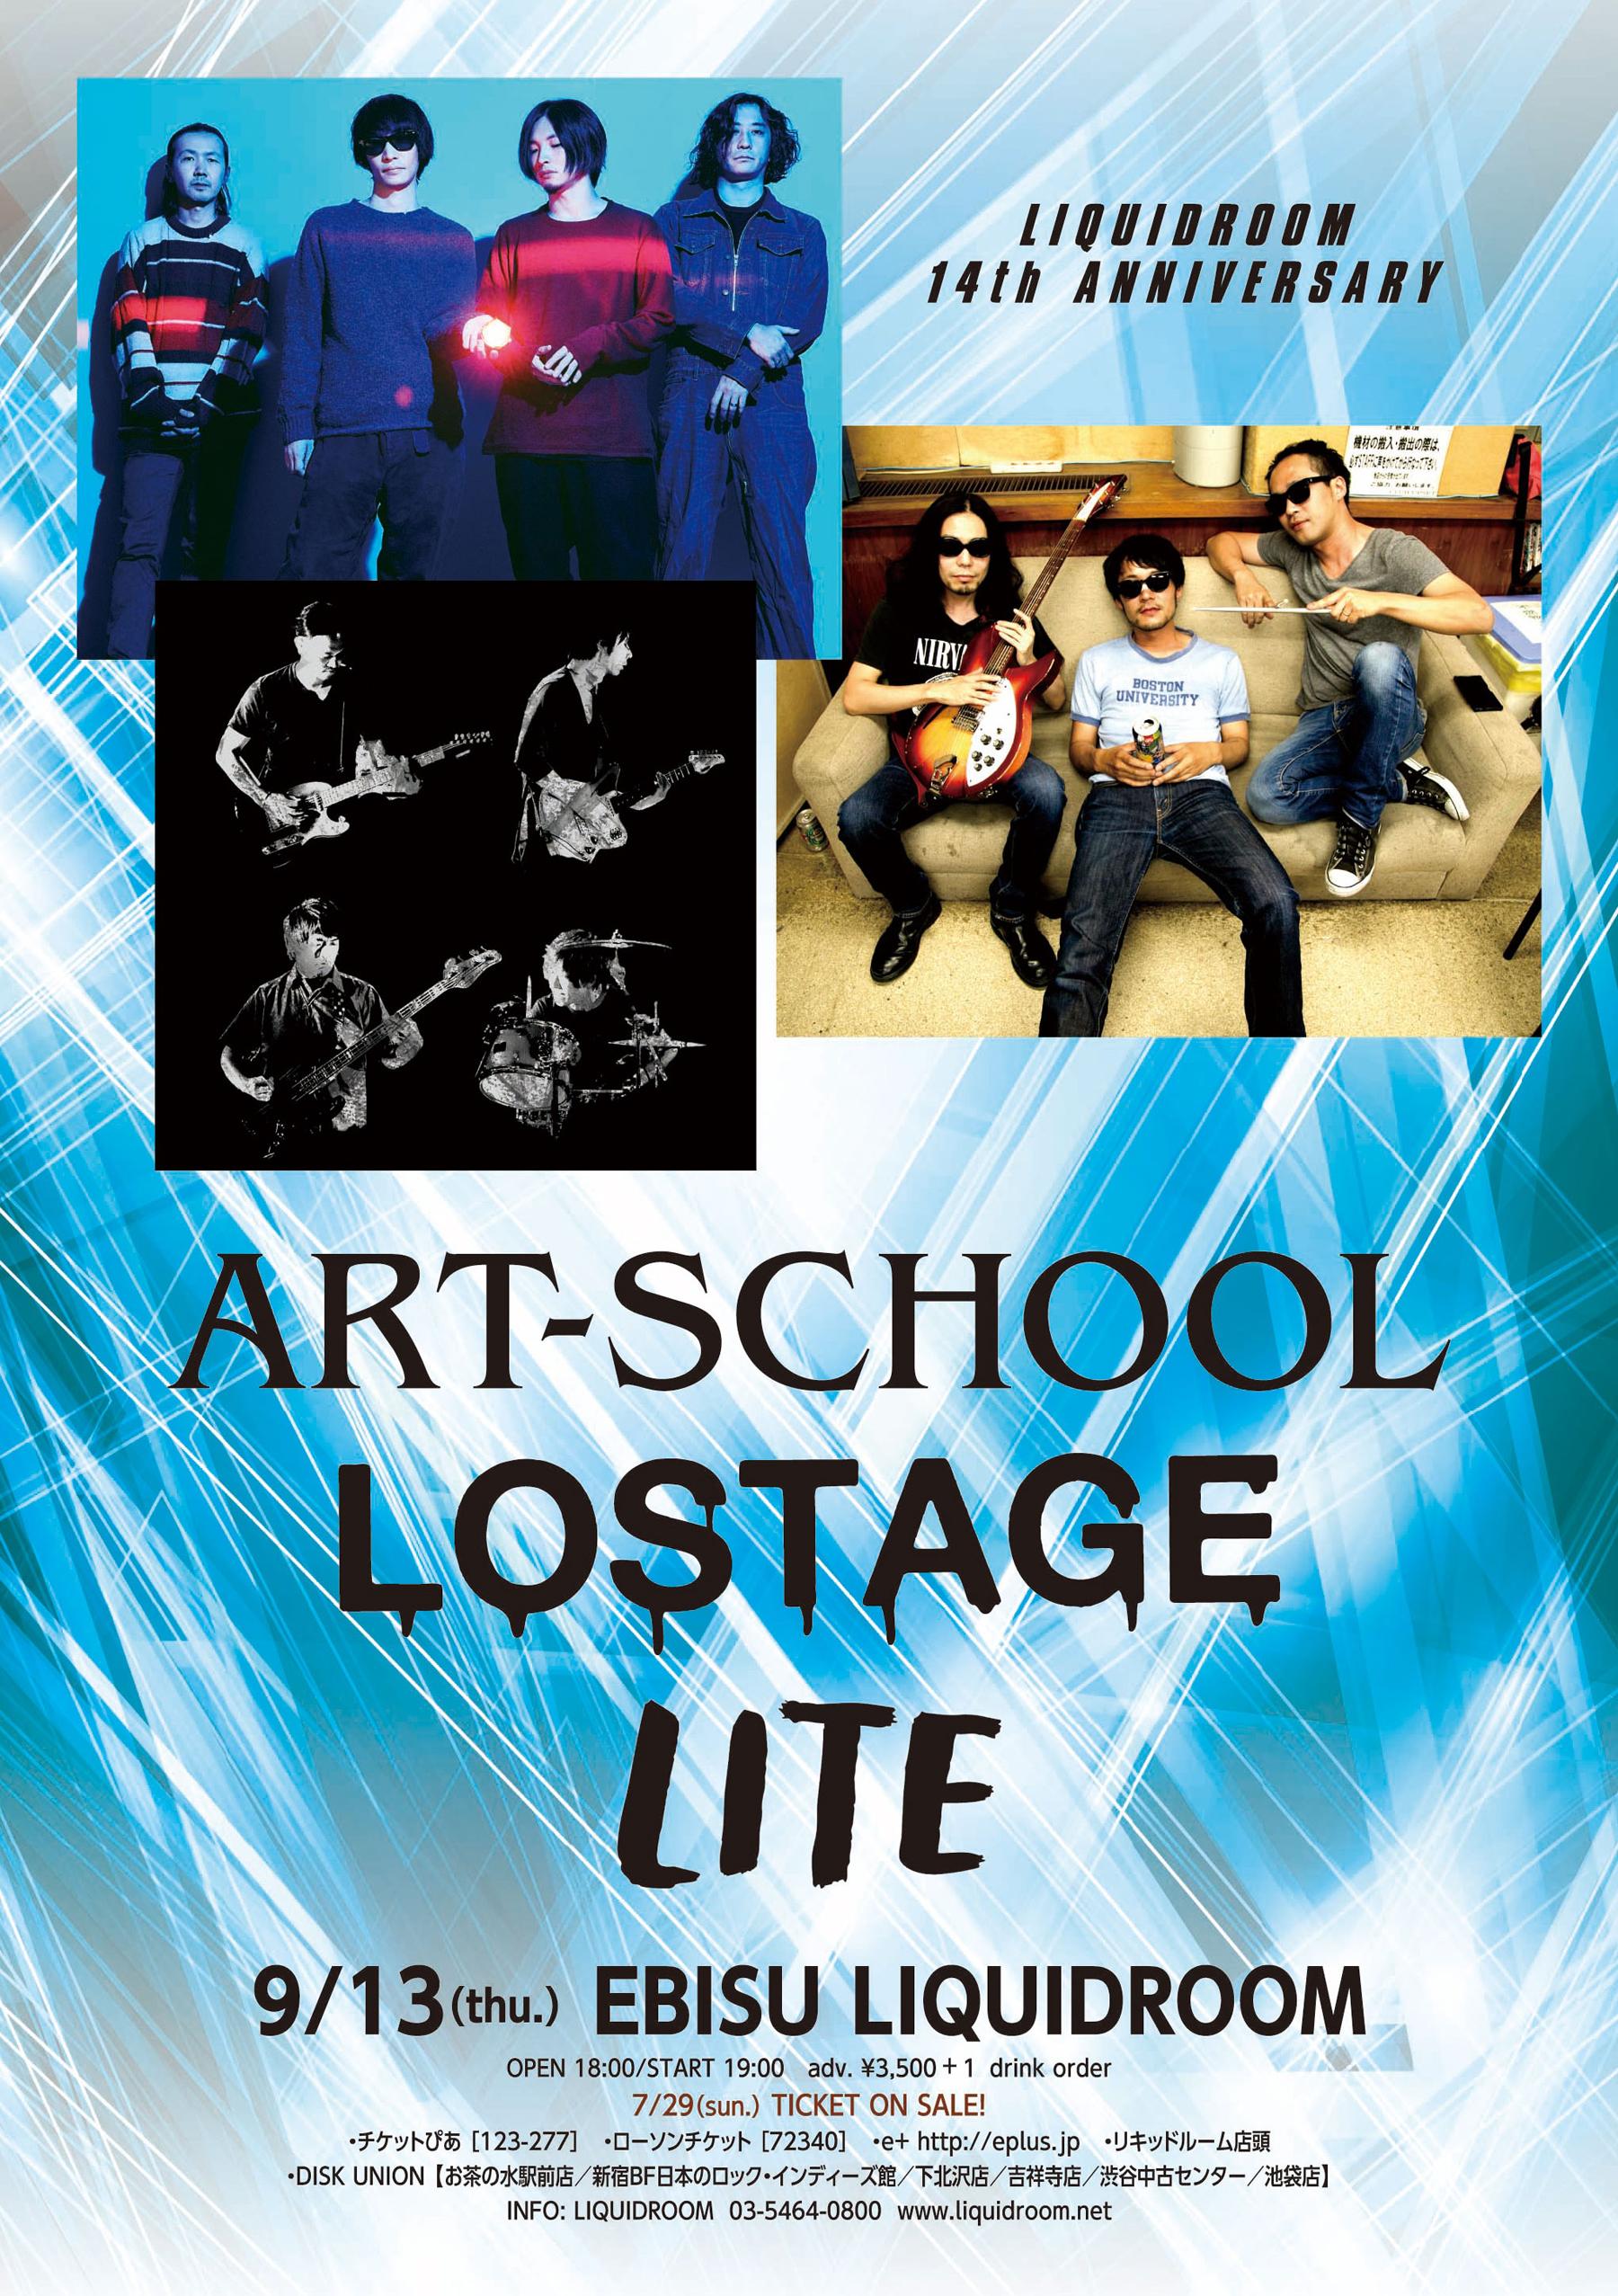 ART-SCHOOL x LOSTAGE x LITE